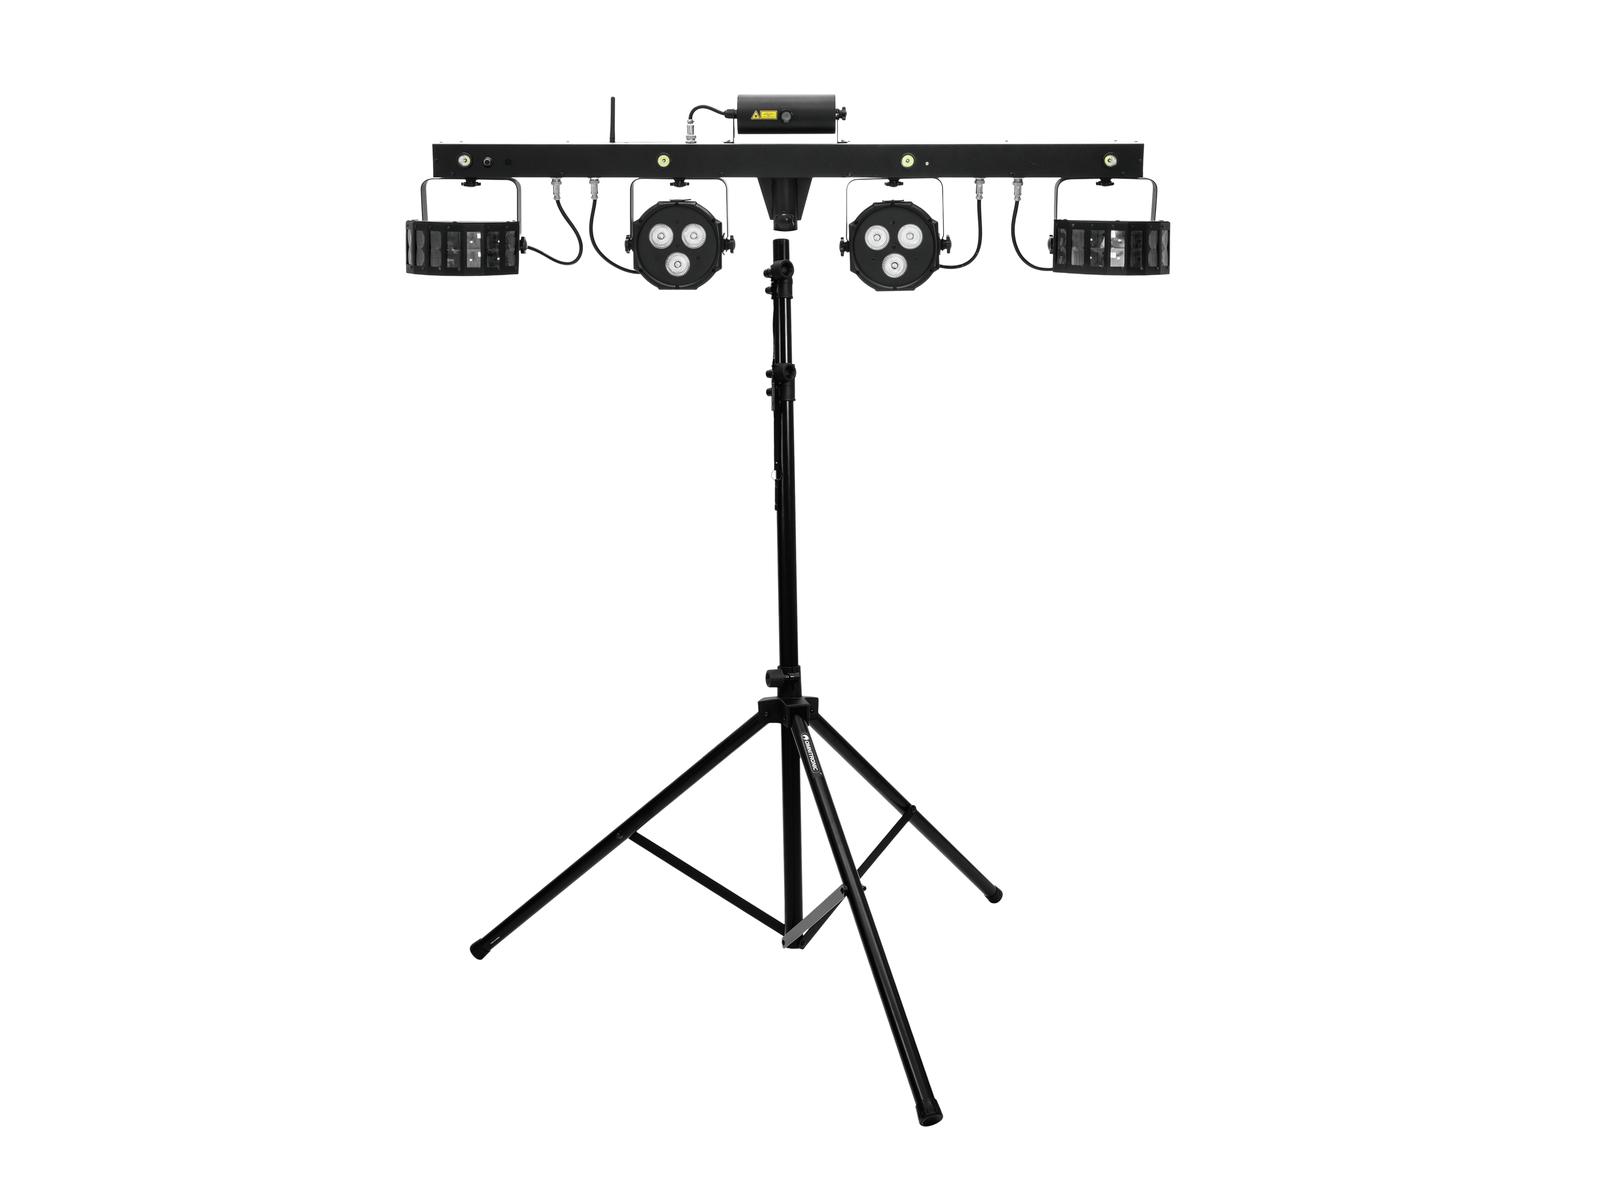 eurolite-set-led-kls-laser-bar-fx-lichtset-m-4-boxenhochsta-nde, 359.00 EUR @ music-and-more-store